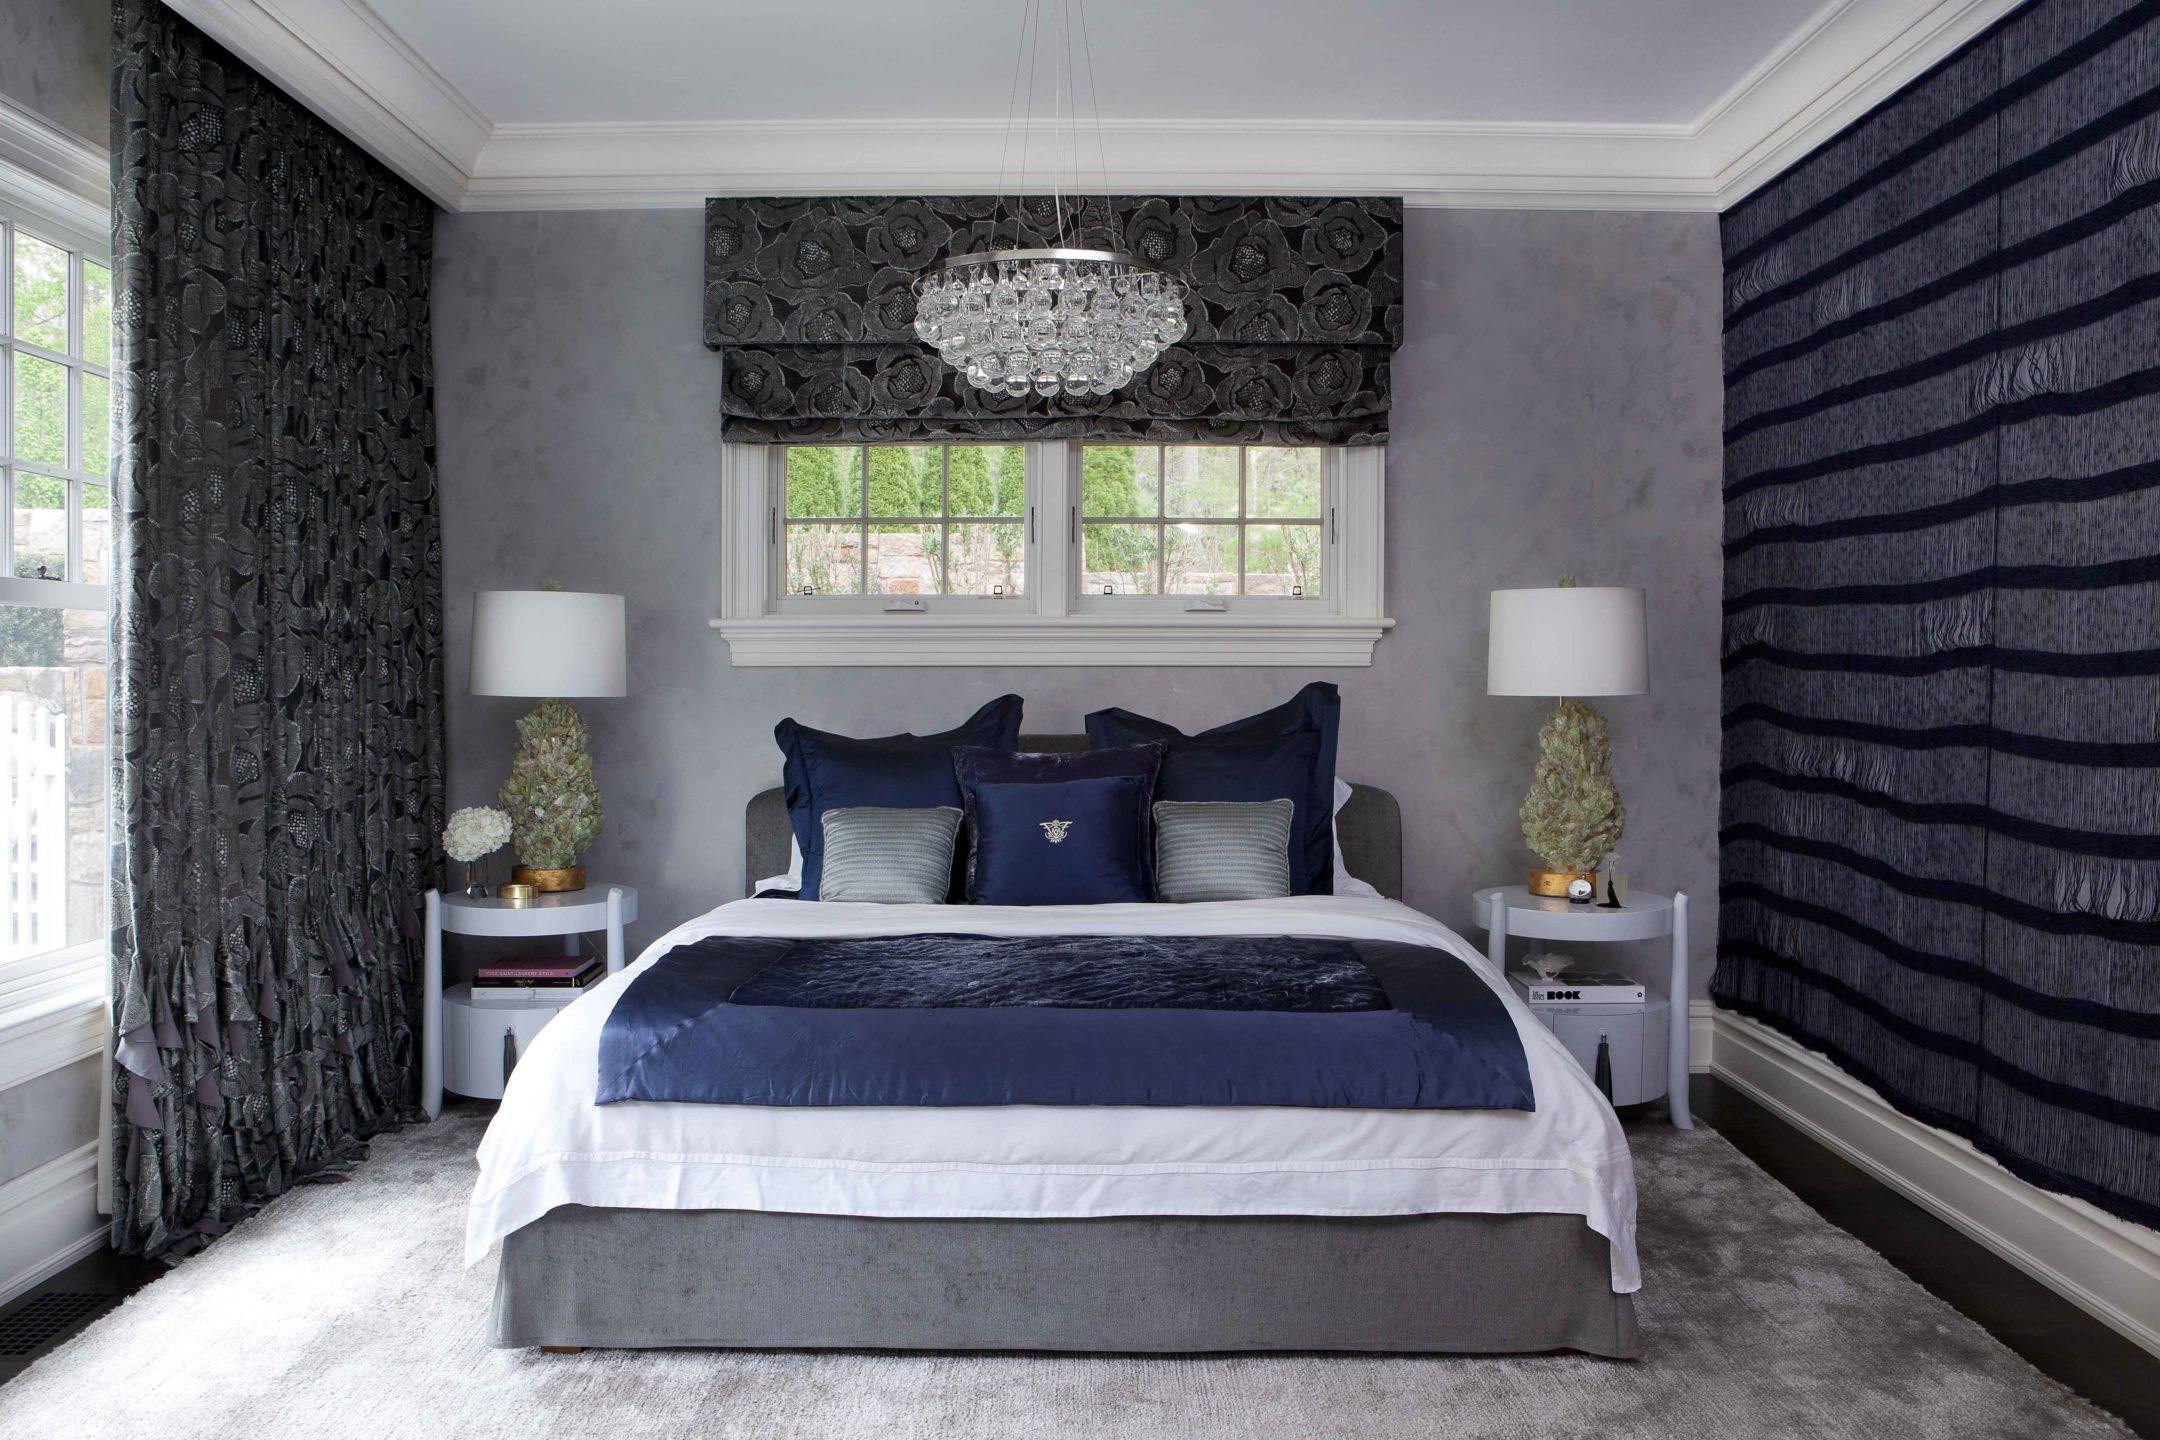 Nicole-Fuller-Interiors-Dutchess-Suffern-Estate-bedroom-new-york-interior-designer